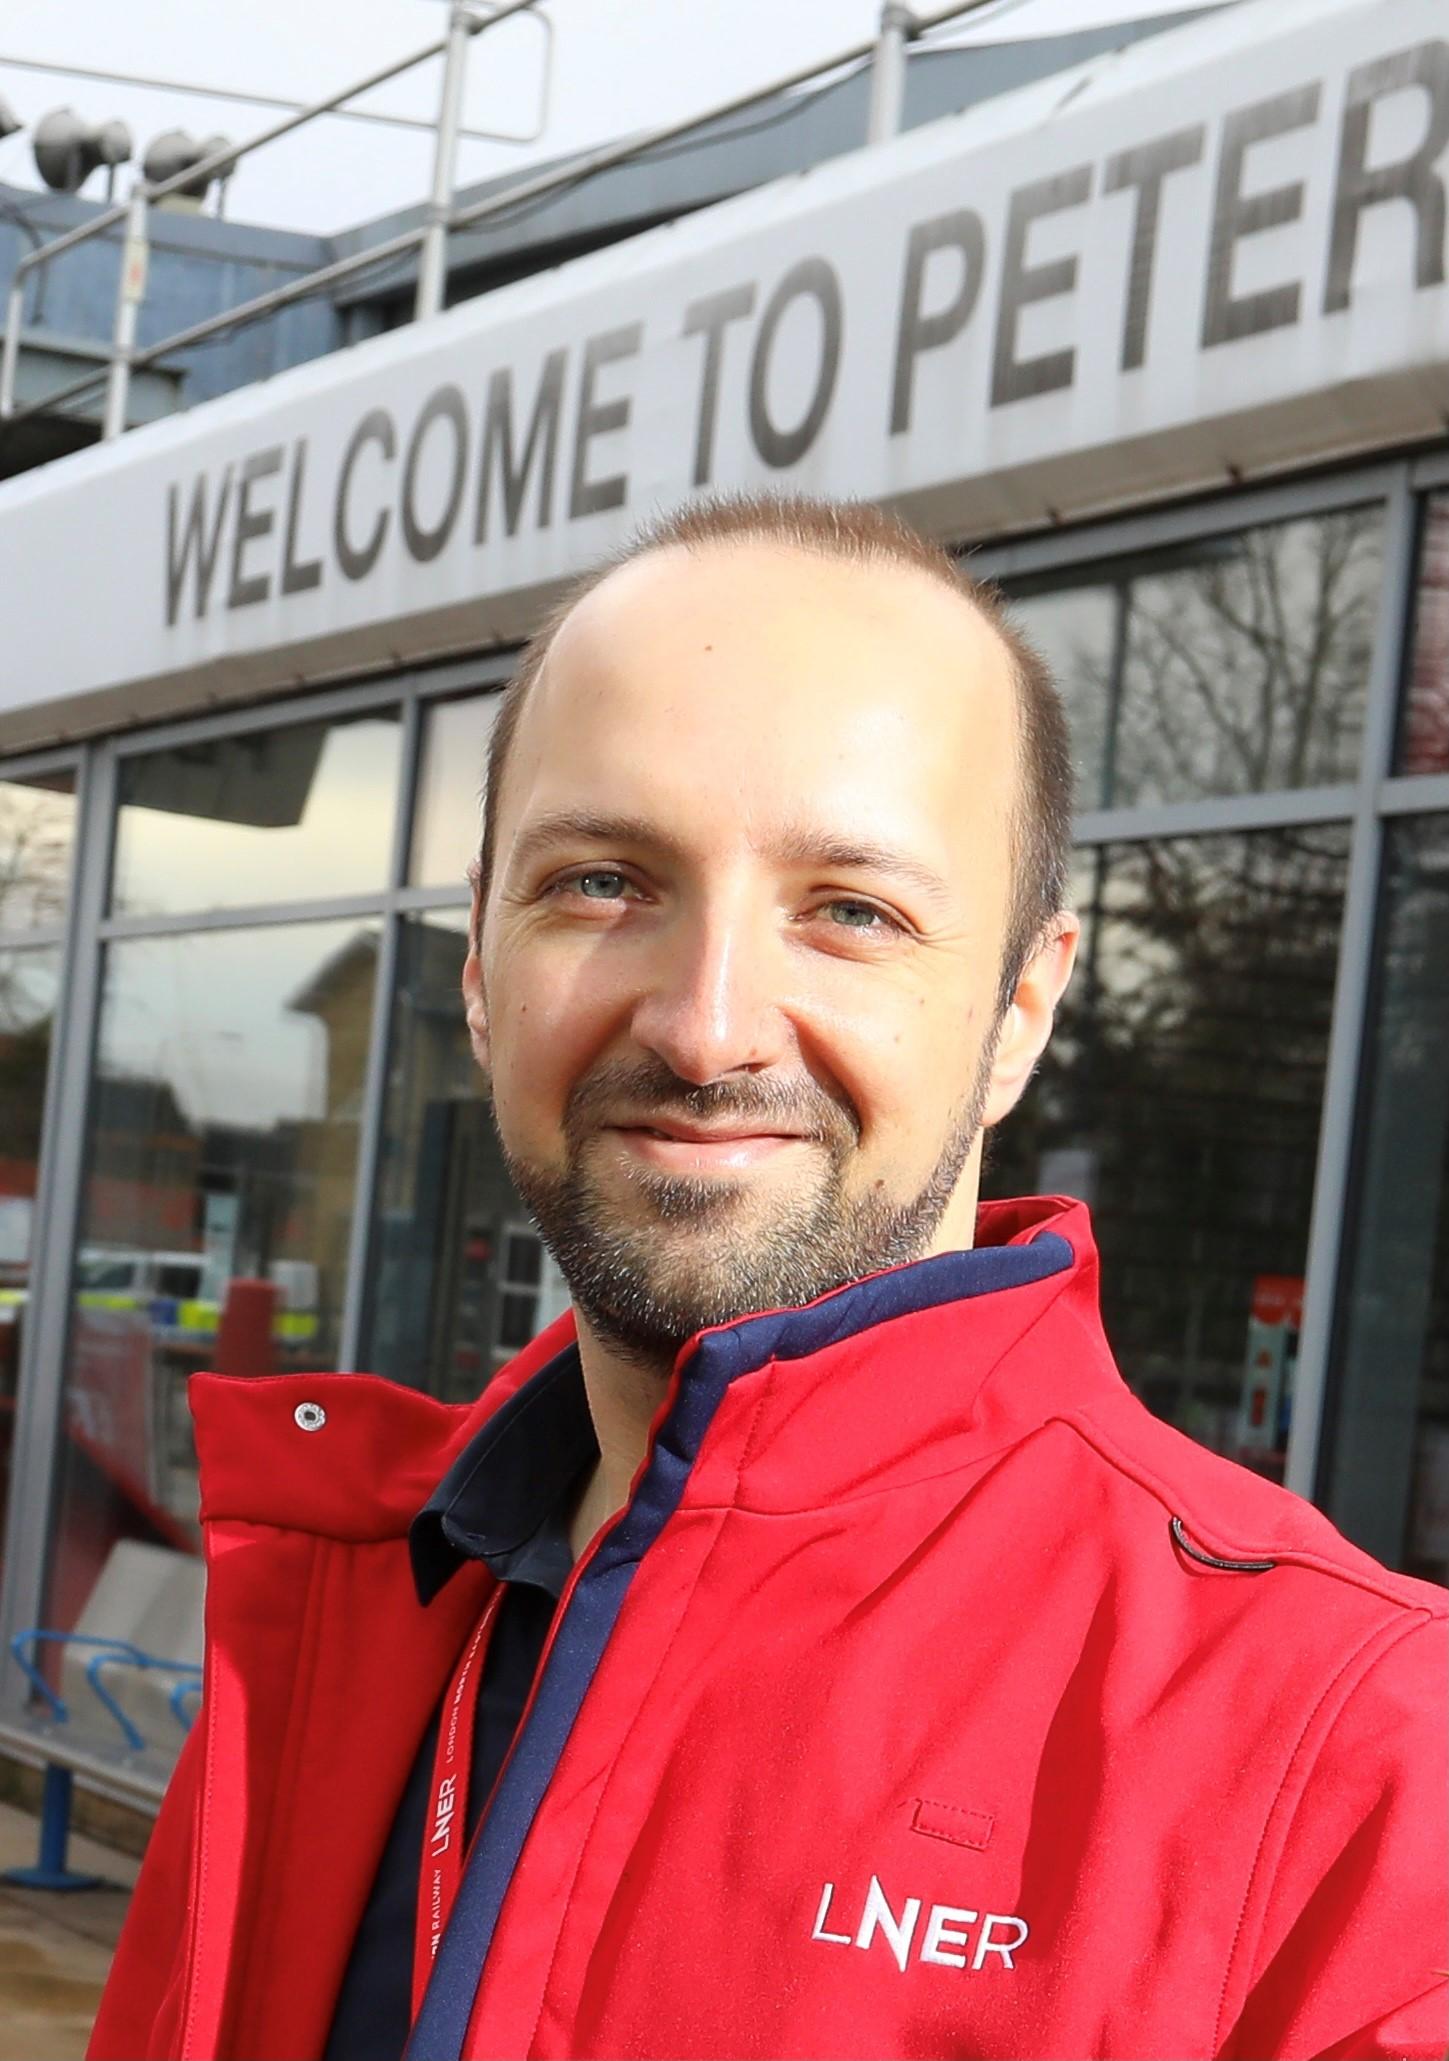 Anthony PateyJohns wearing a red LNER branded jacket stands on a railway station platform.